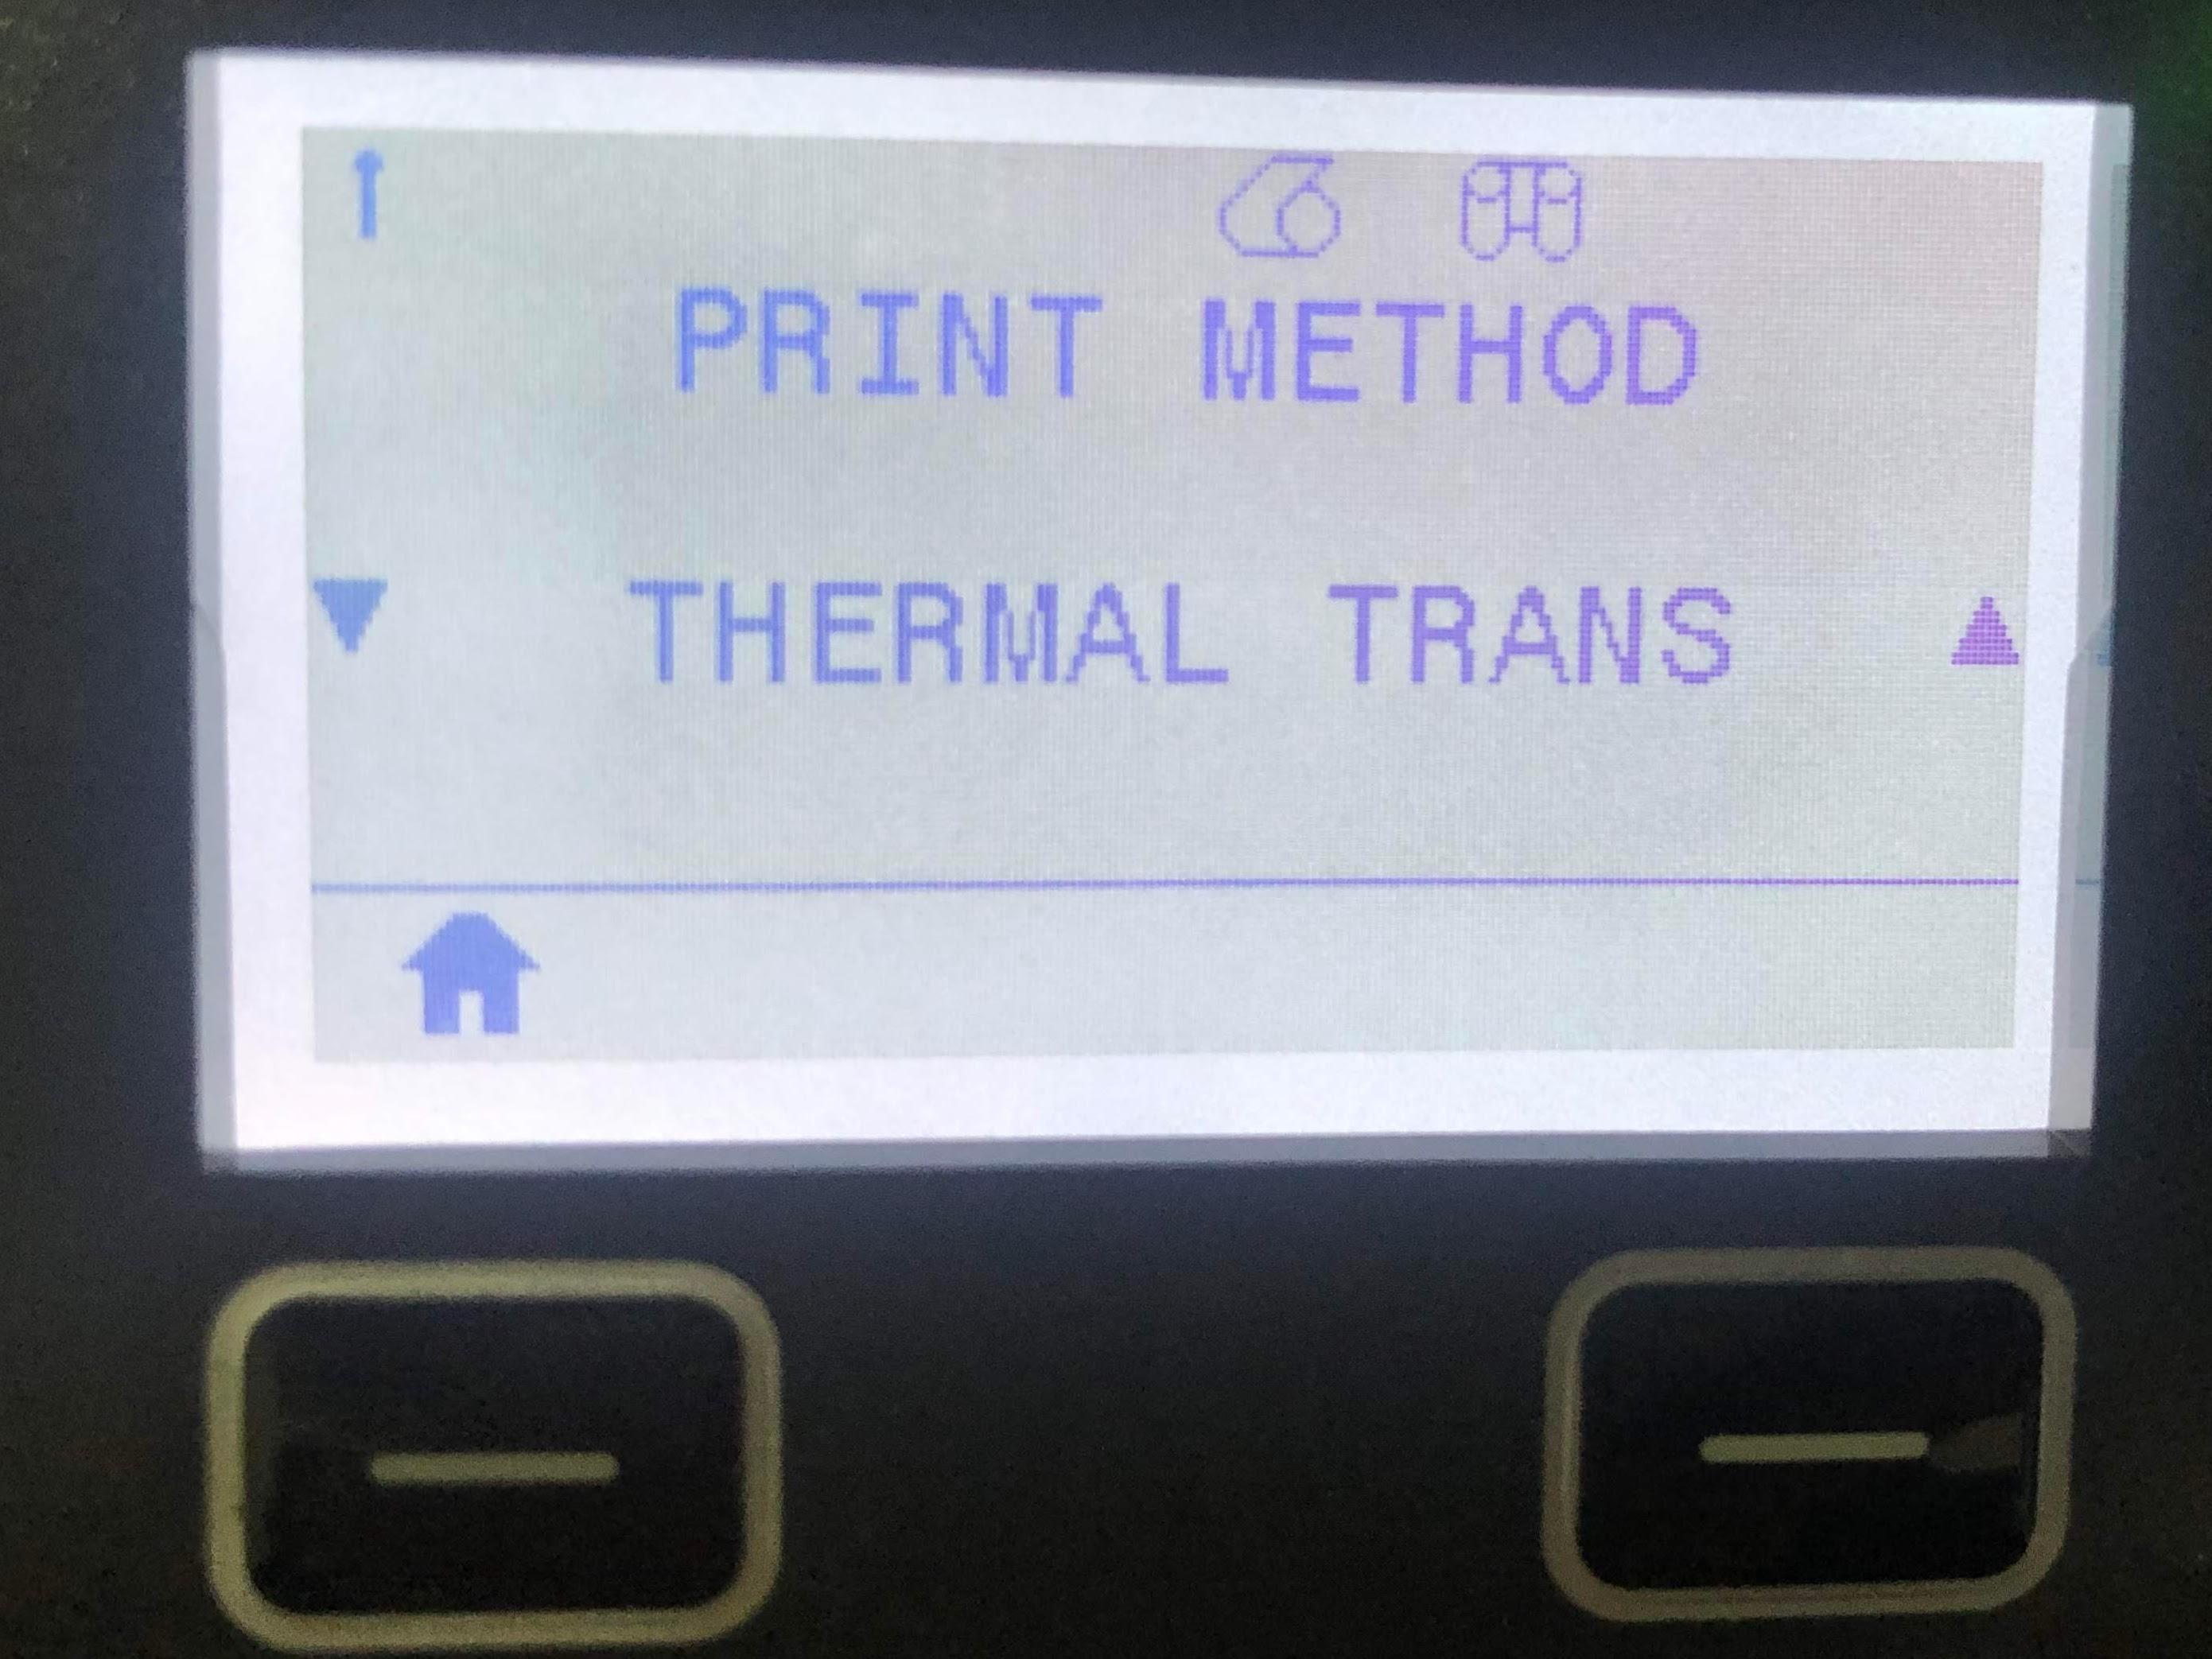 Thermal Trans